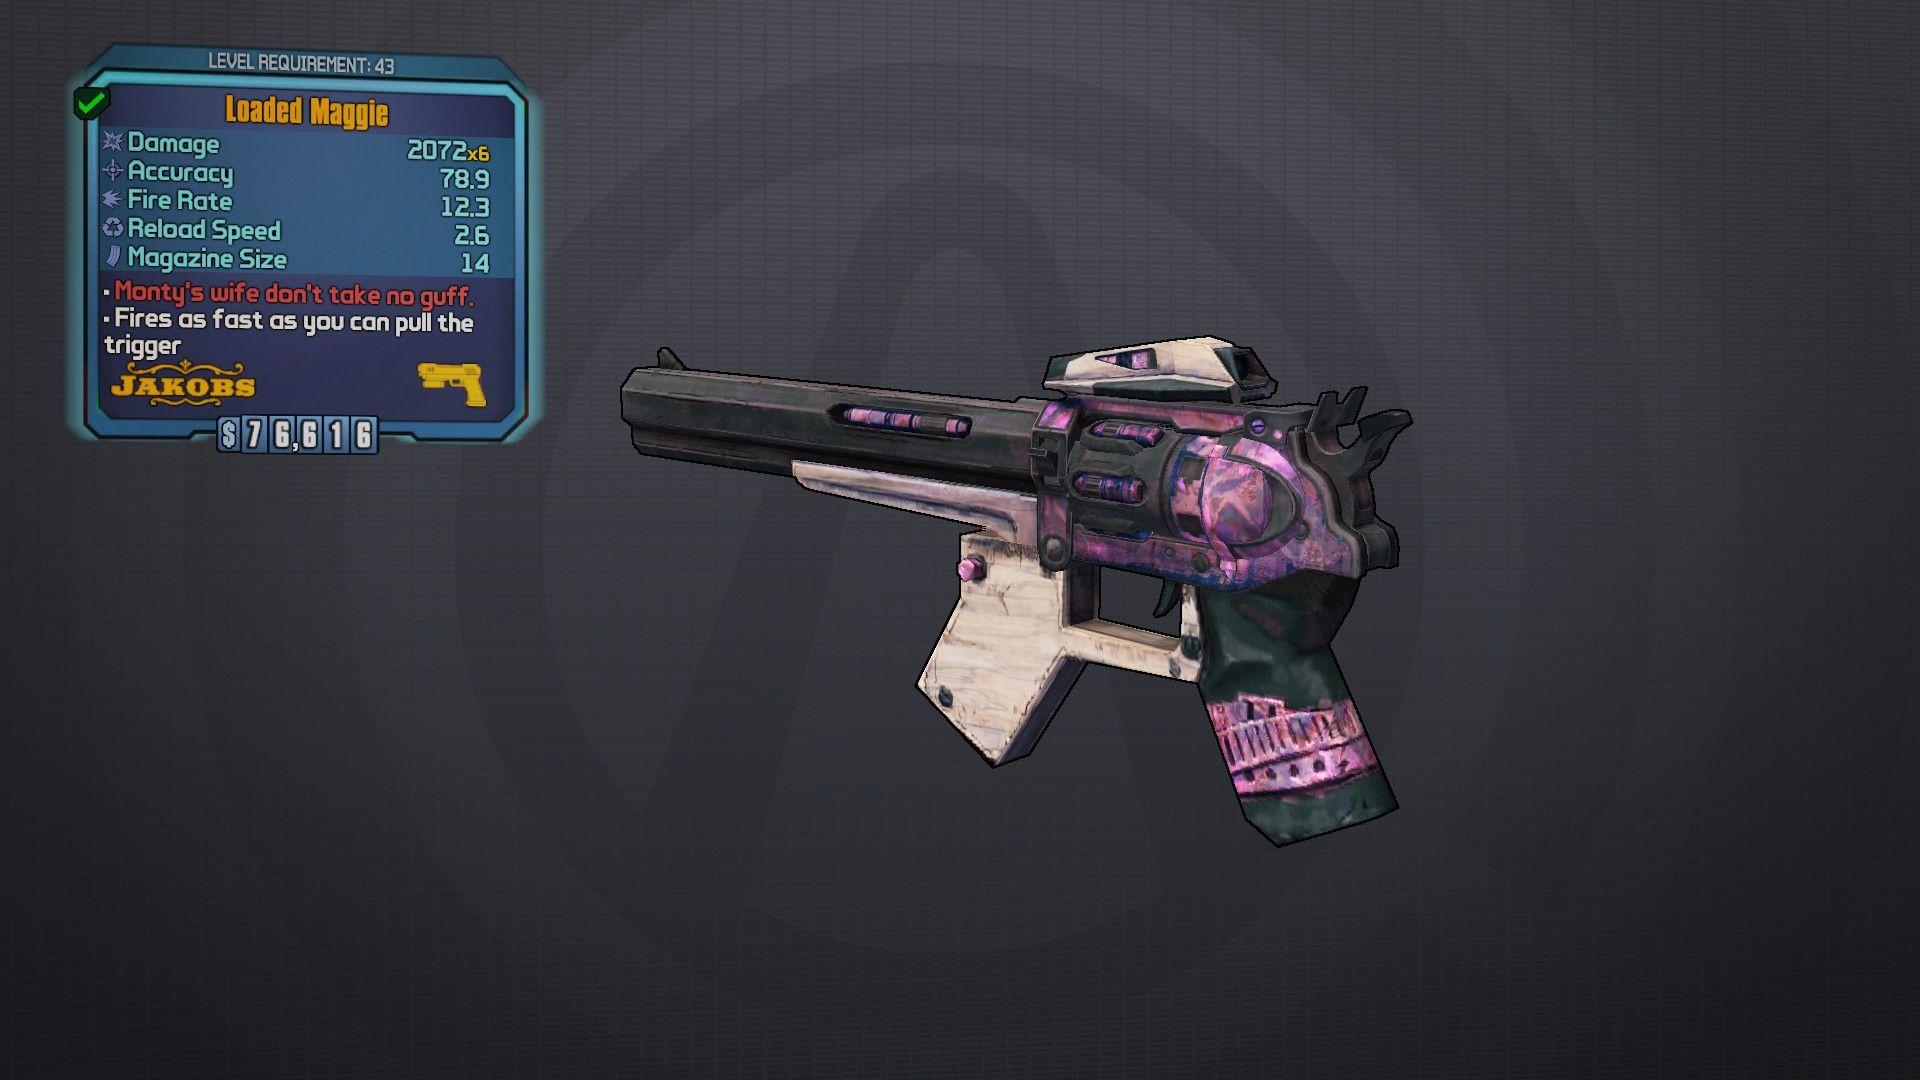 Maggie Legendary pistol Borderlands, Weapon concept art